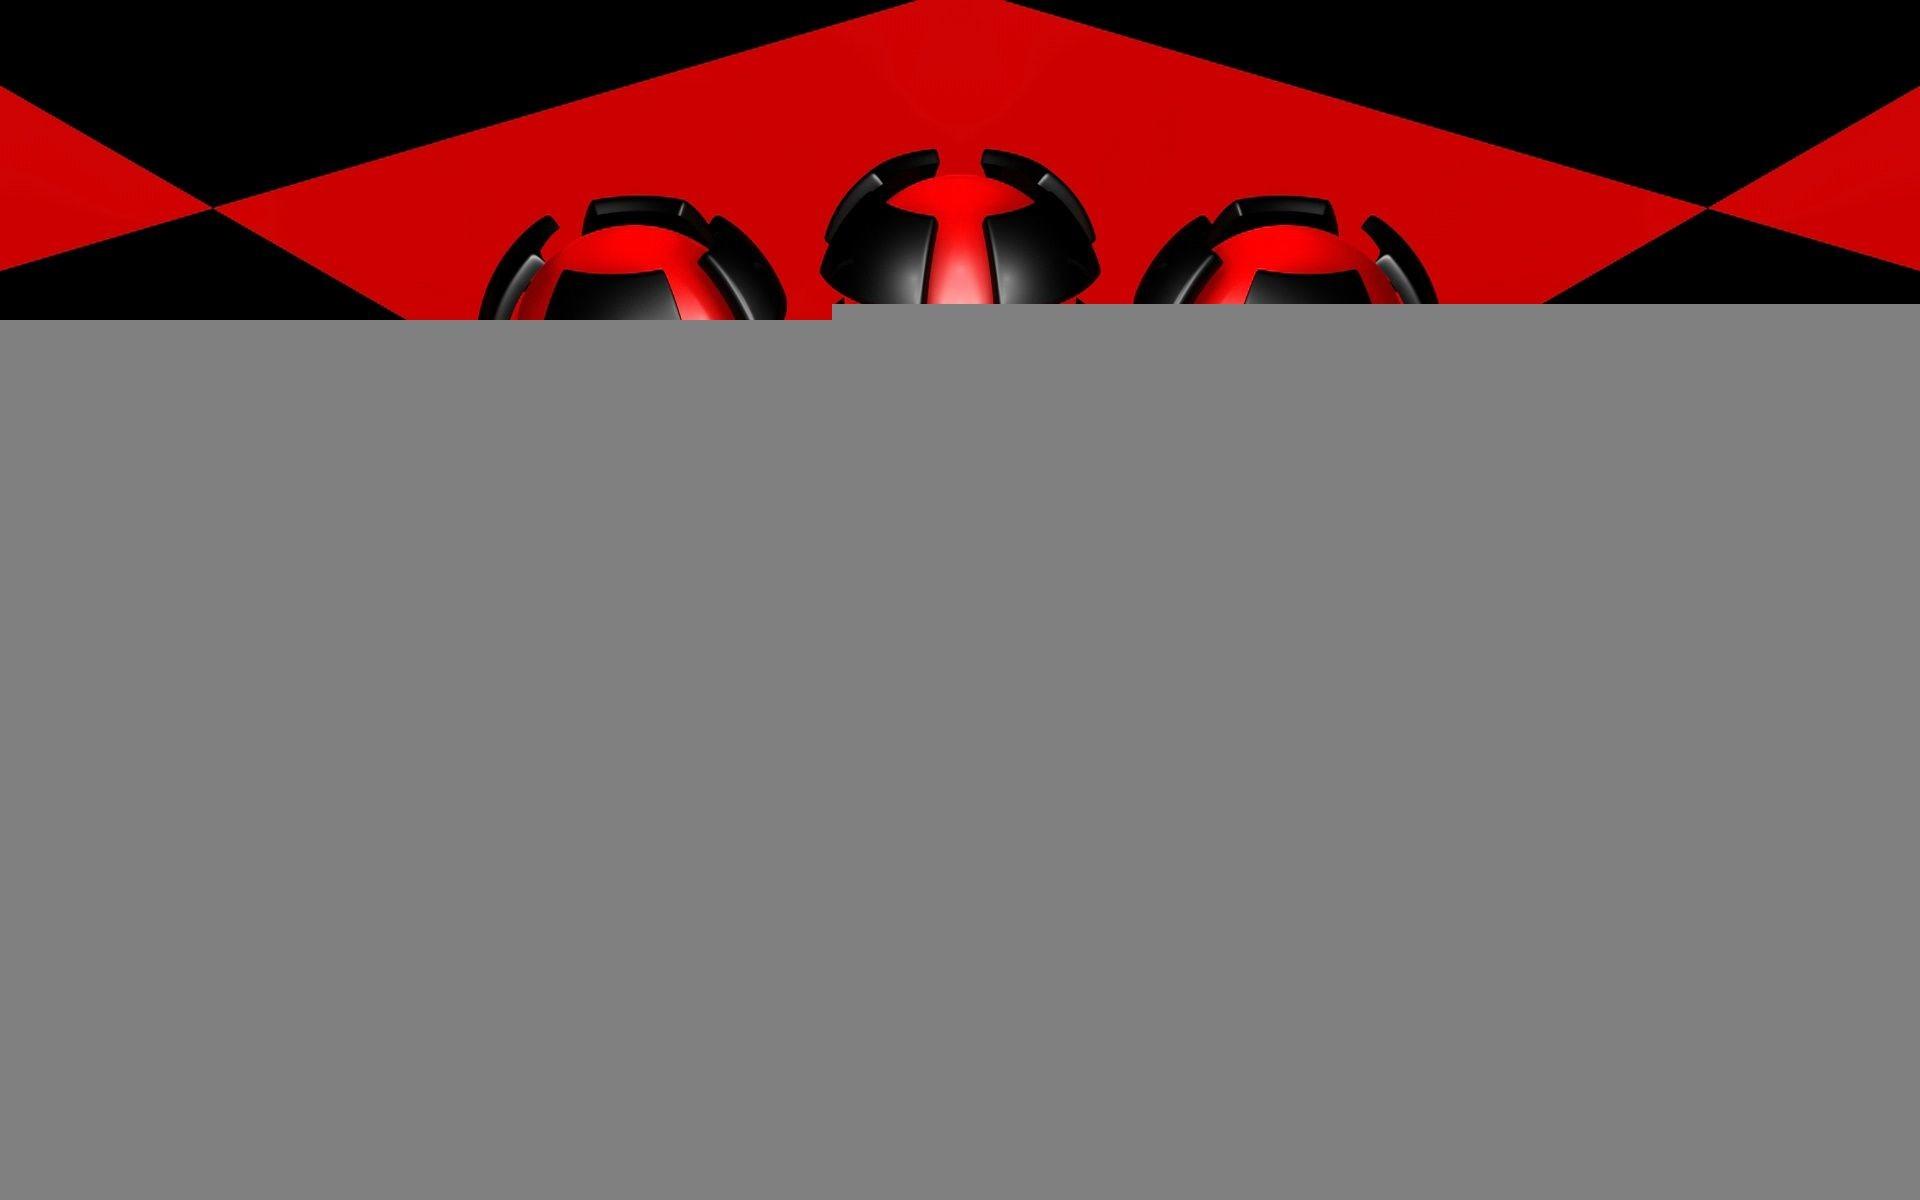 Cool Red And Black Wallpapers 1 Cool Wallpaper – Hdblackwallpaper.com